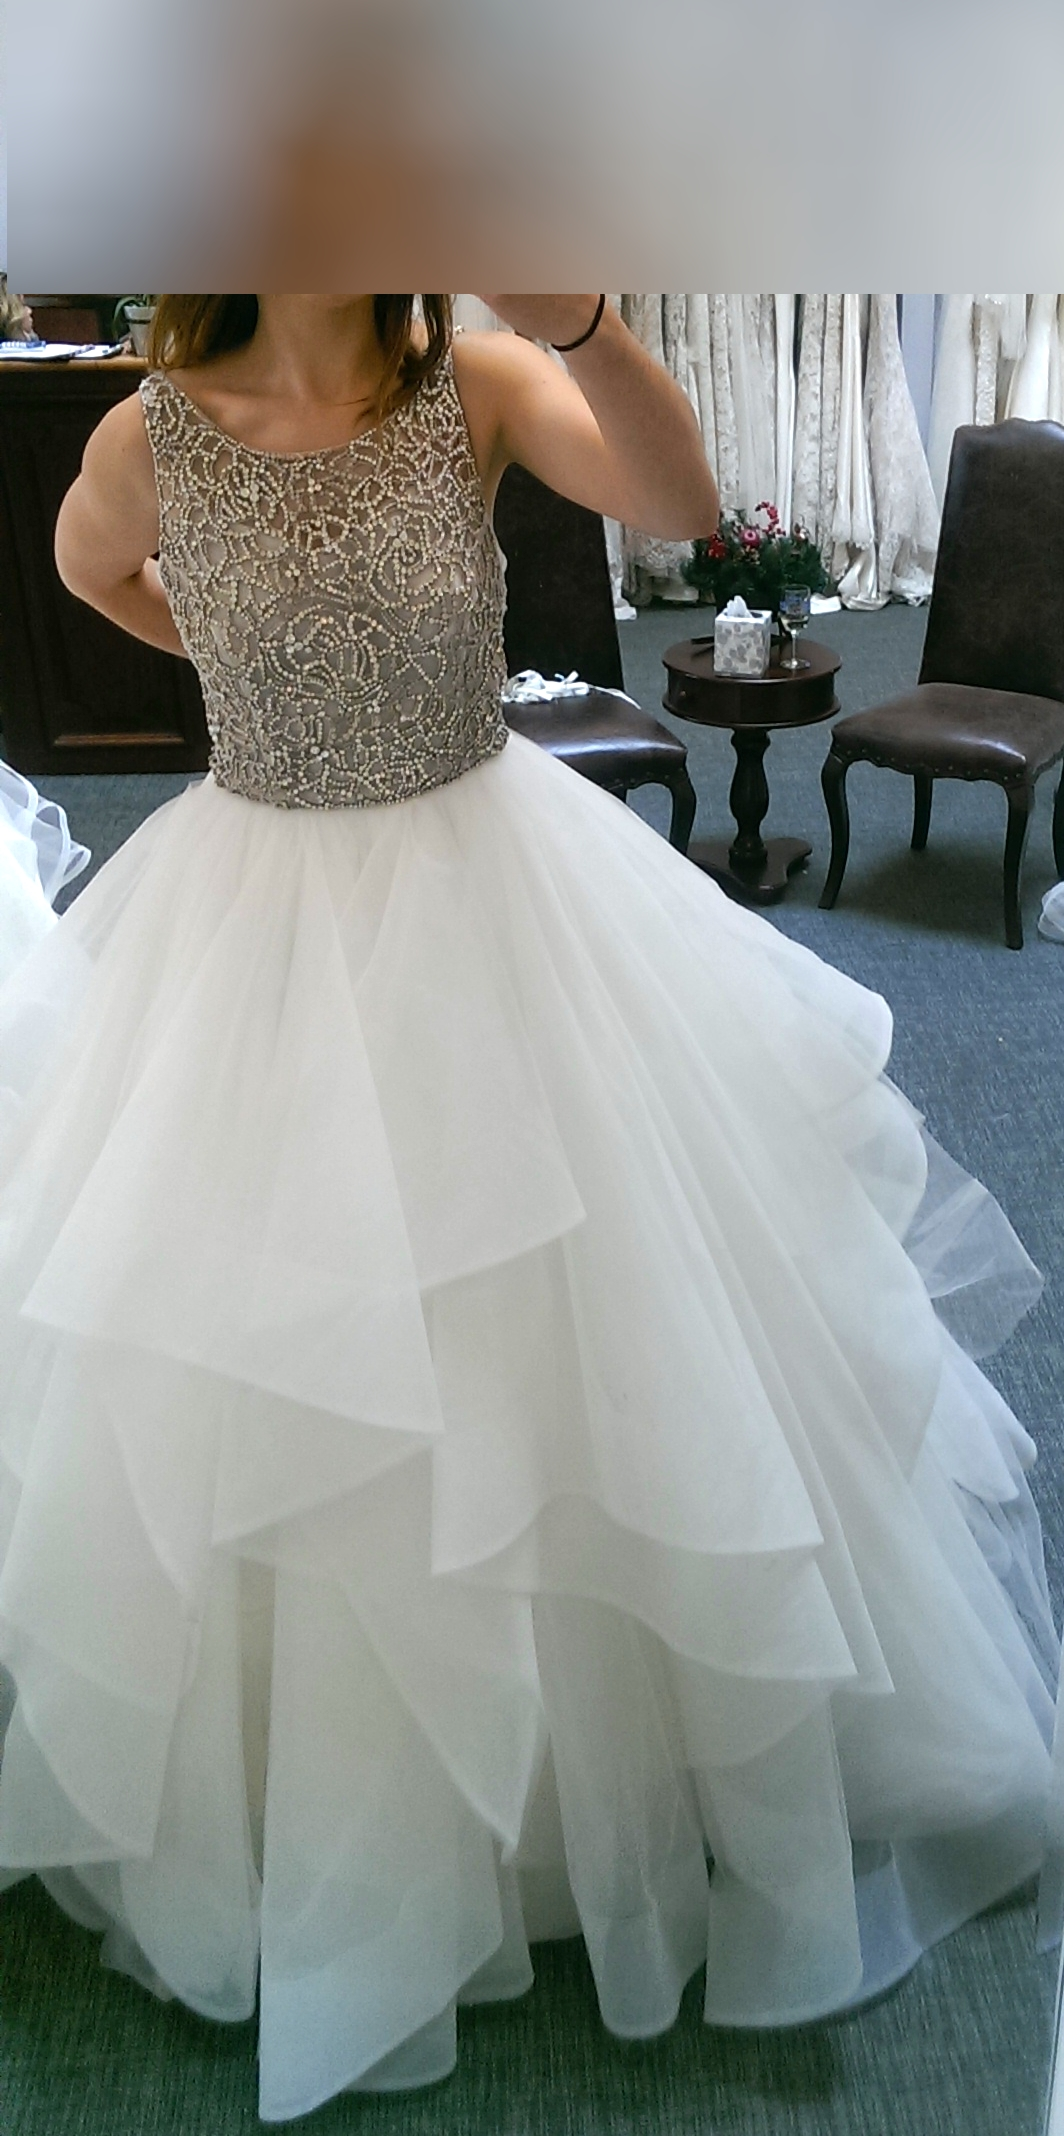 Please help me pick a dress! :)